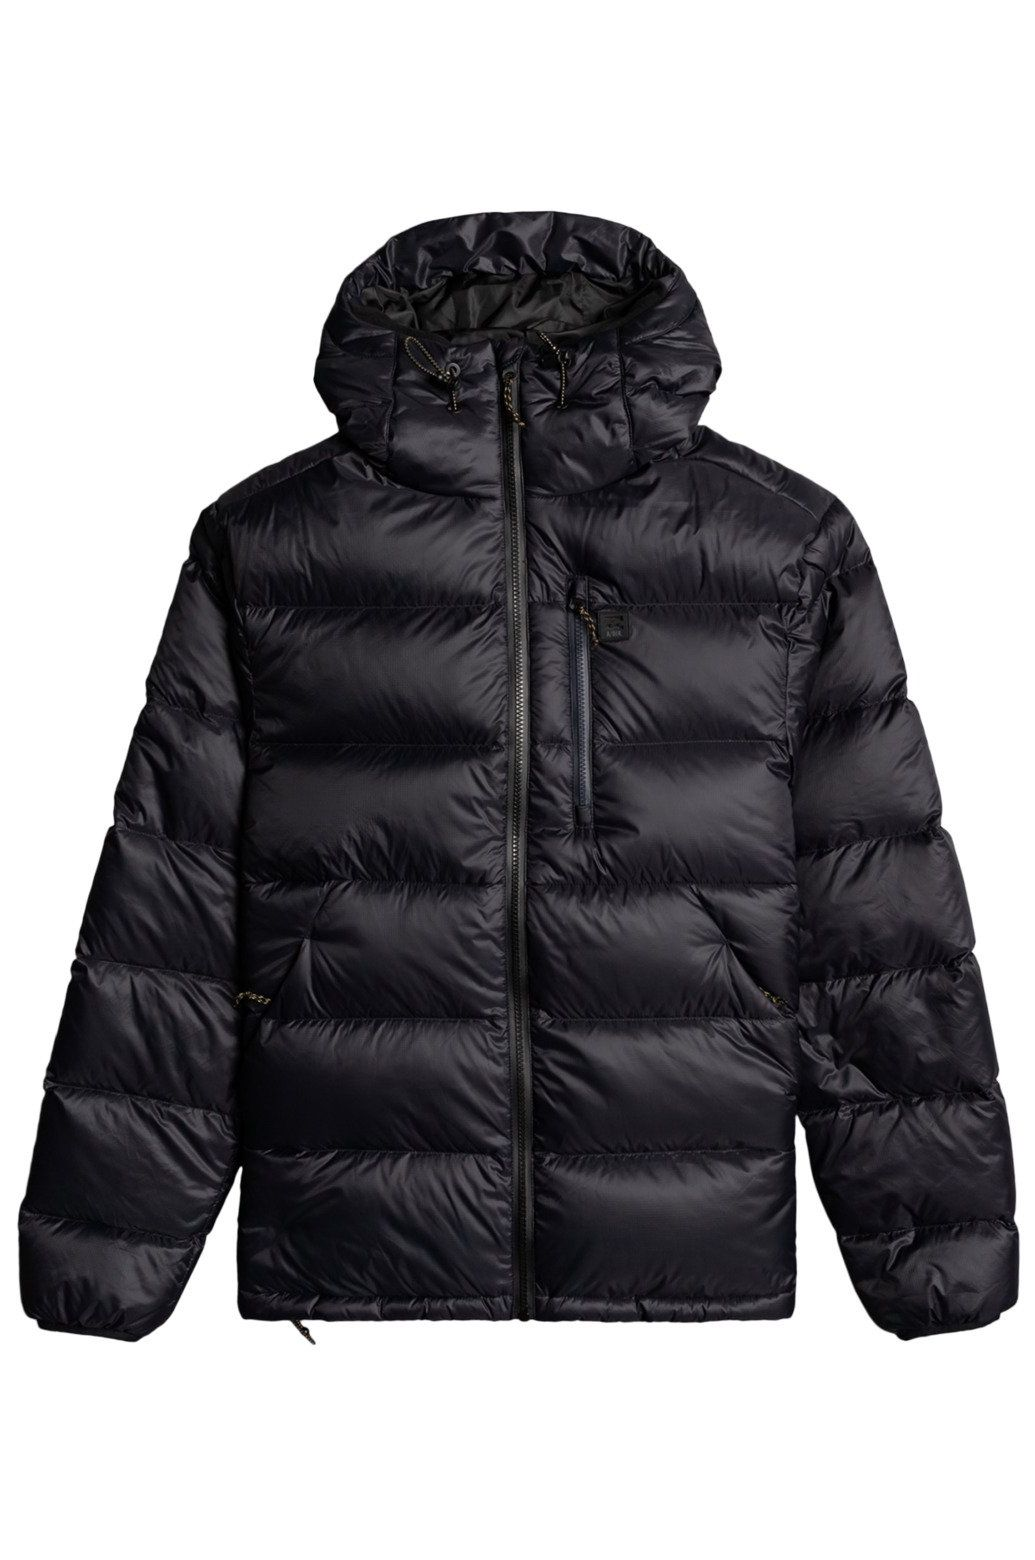 Billabong Jacket BROADPEAK PUFFER ADVENTURE DIVISION Black